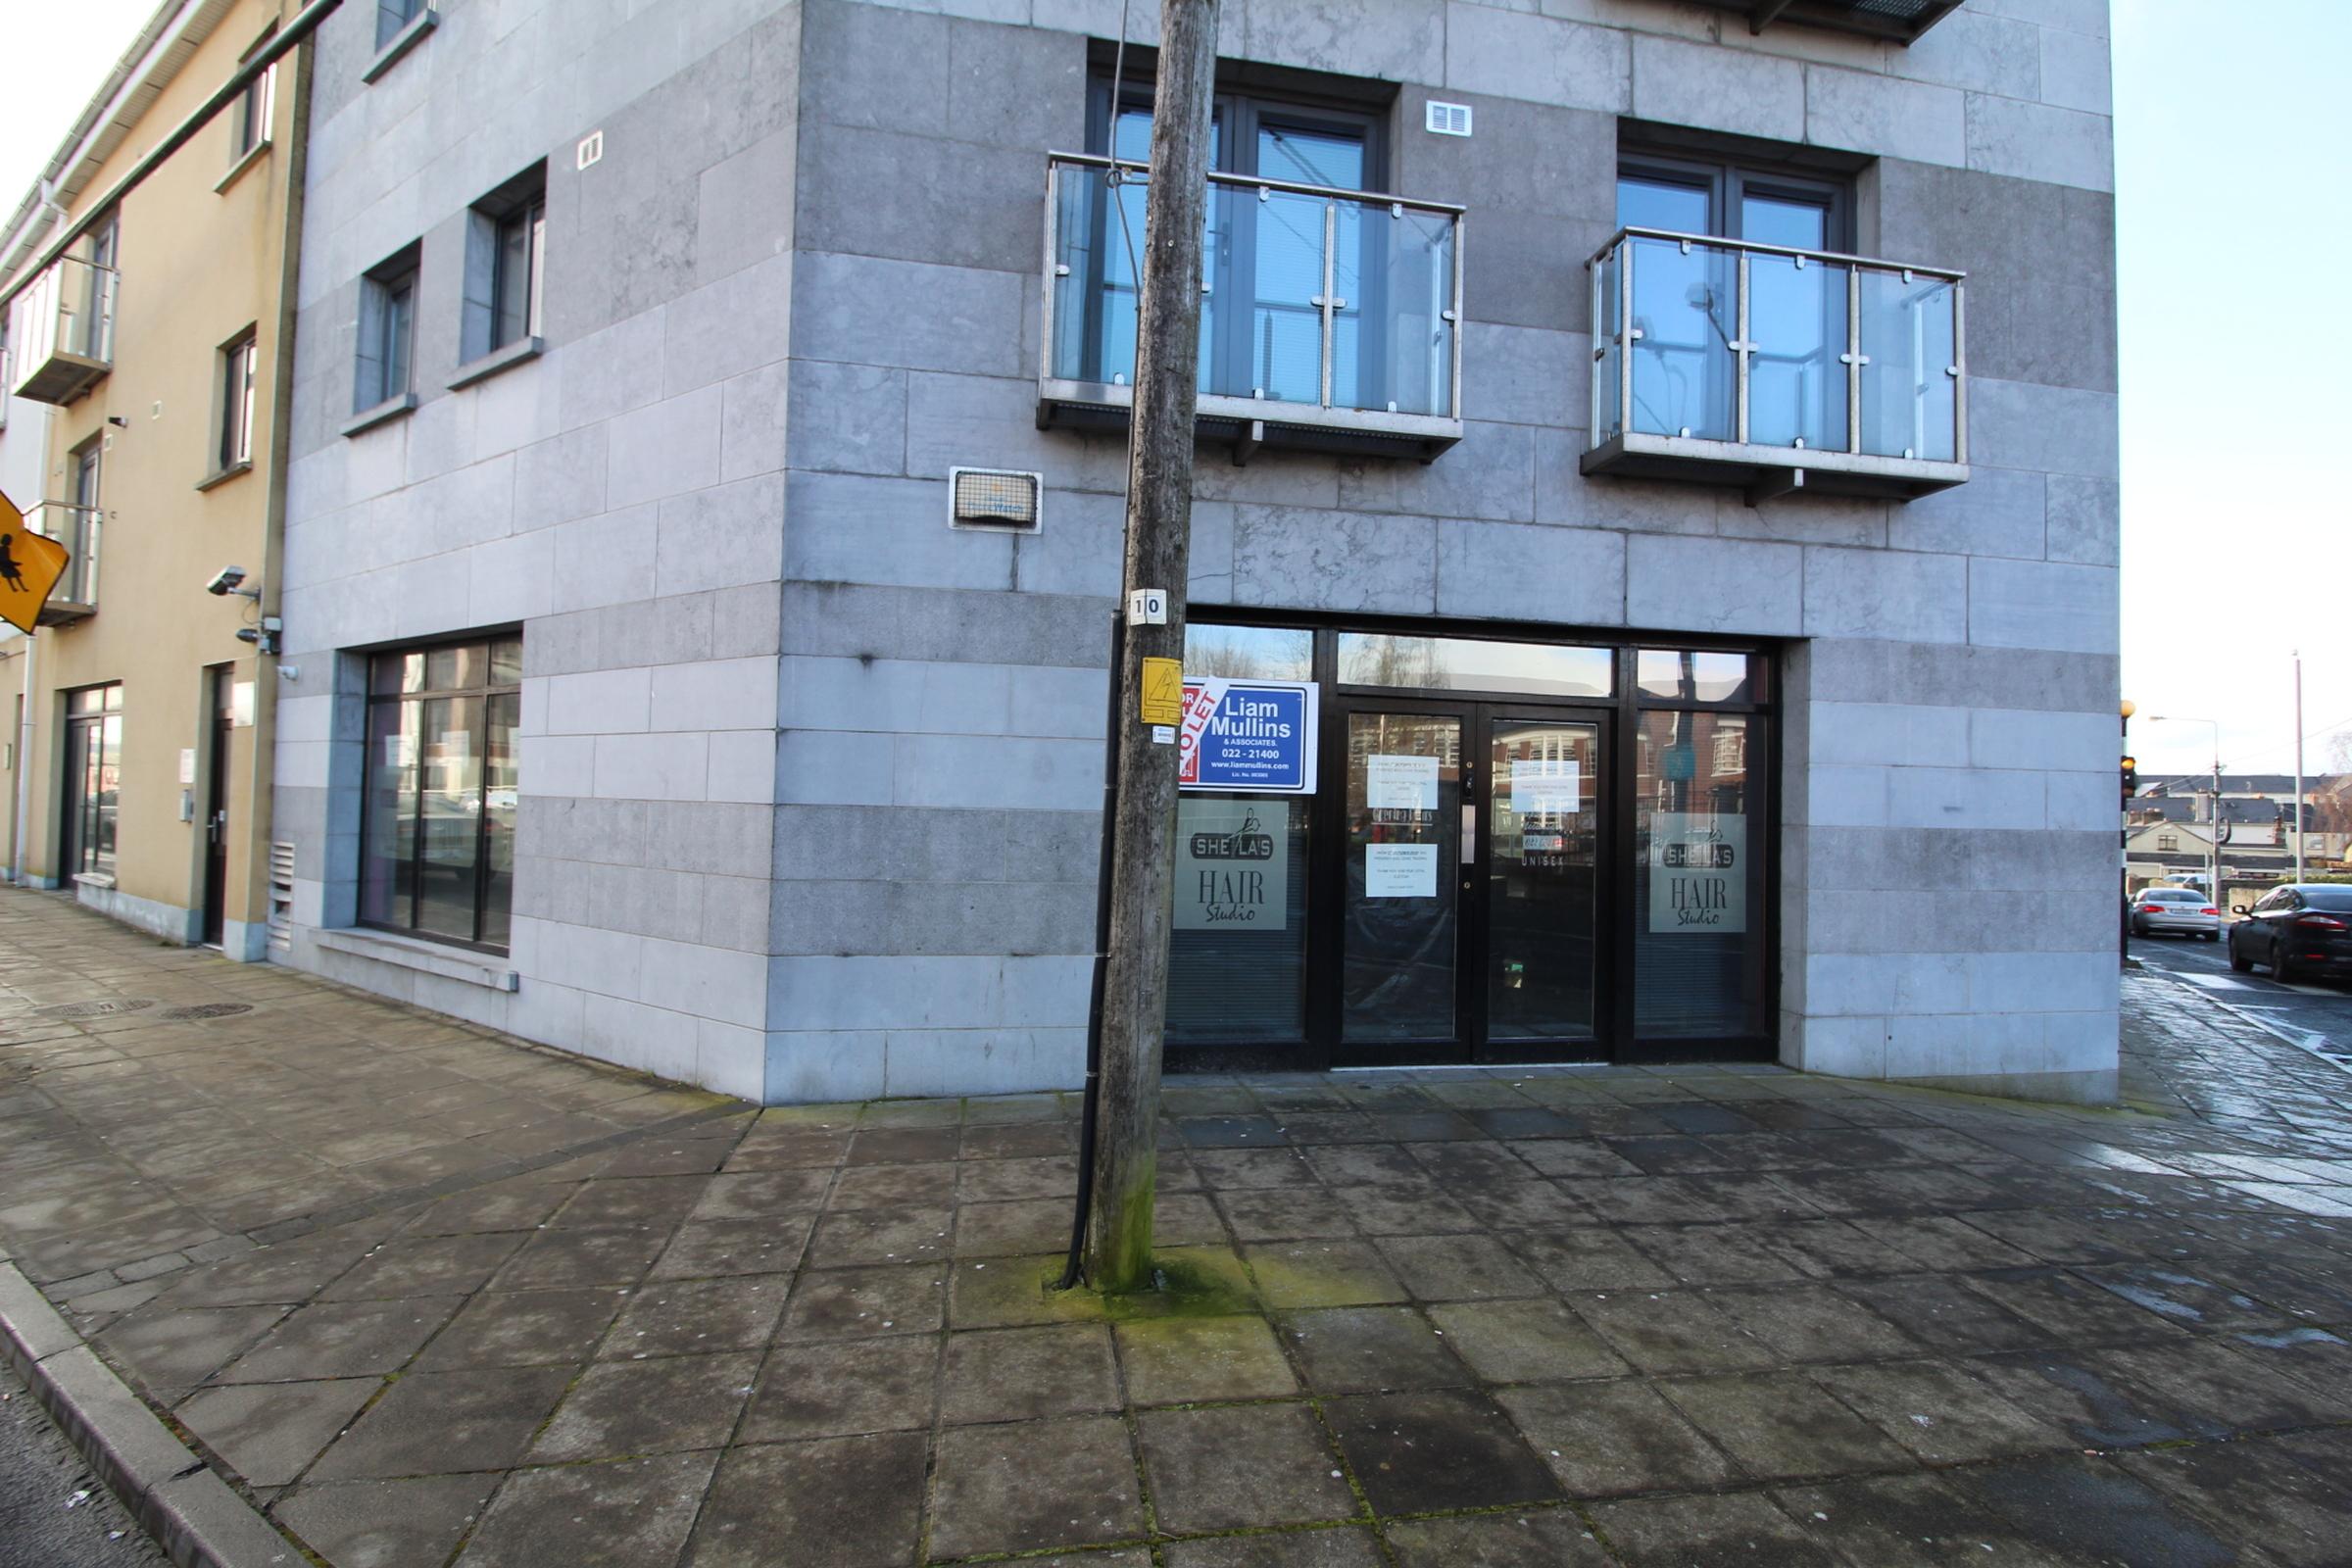 Fairgreen, New, Road, Mallow, Co. Cork